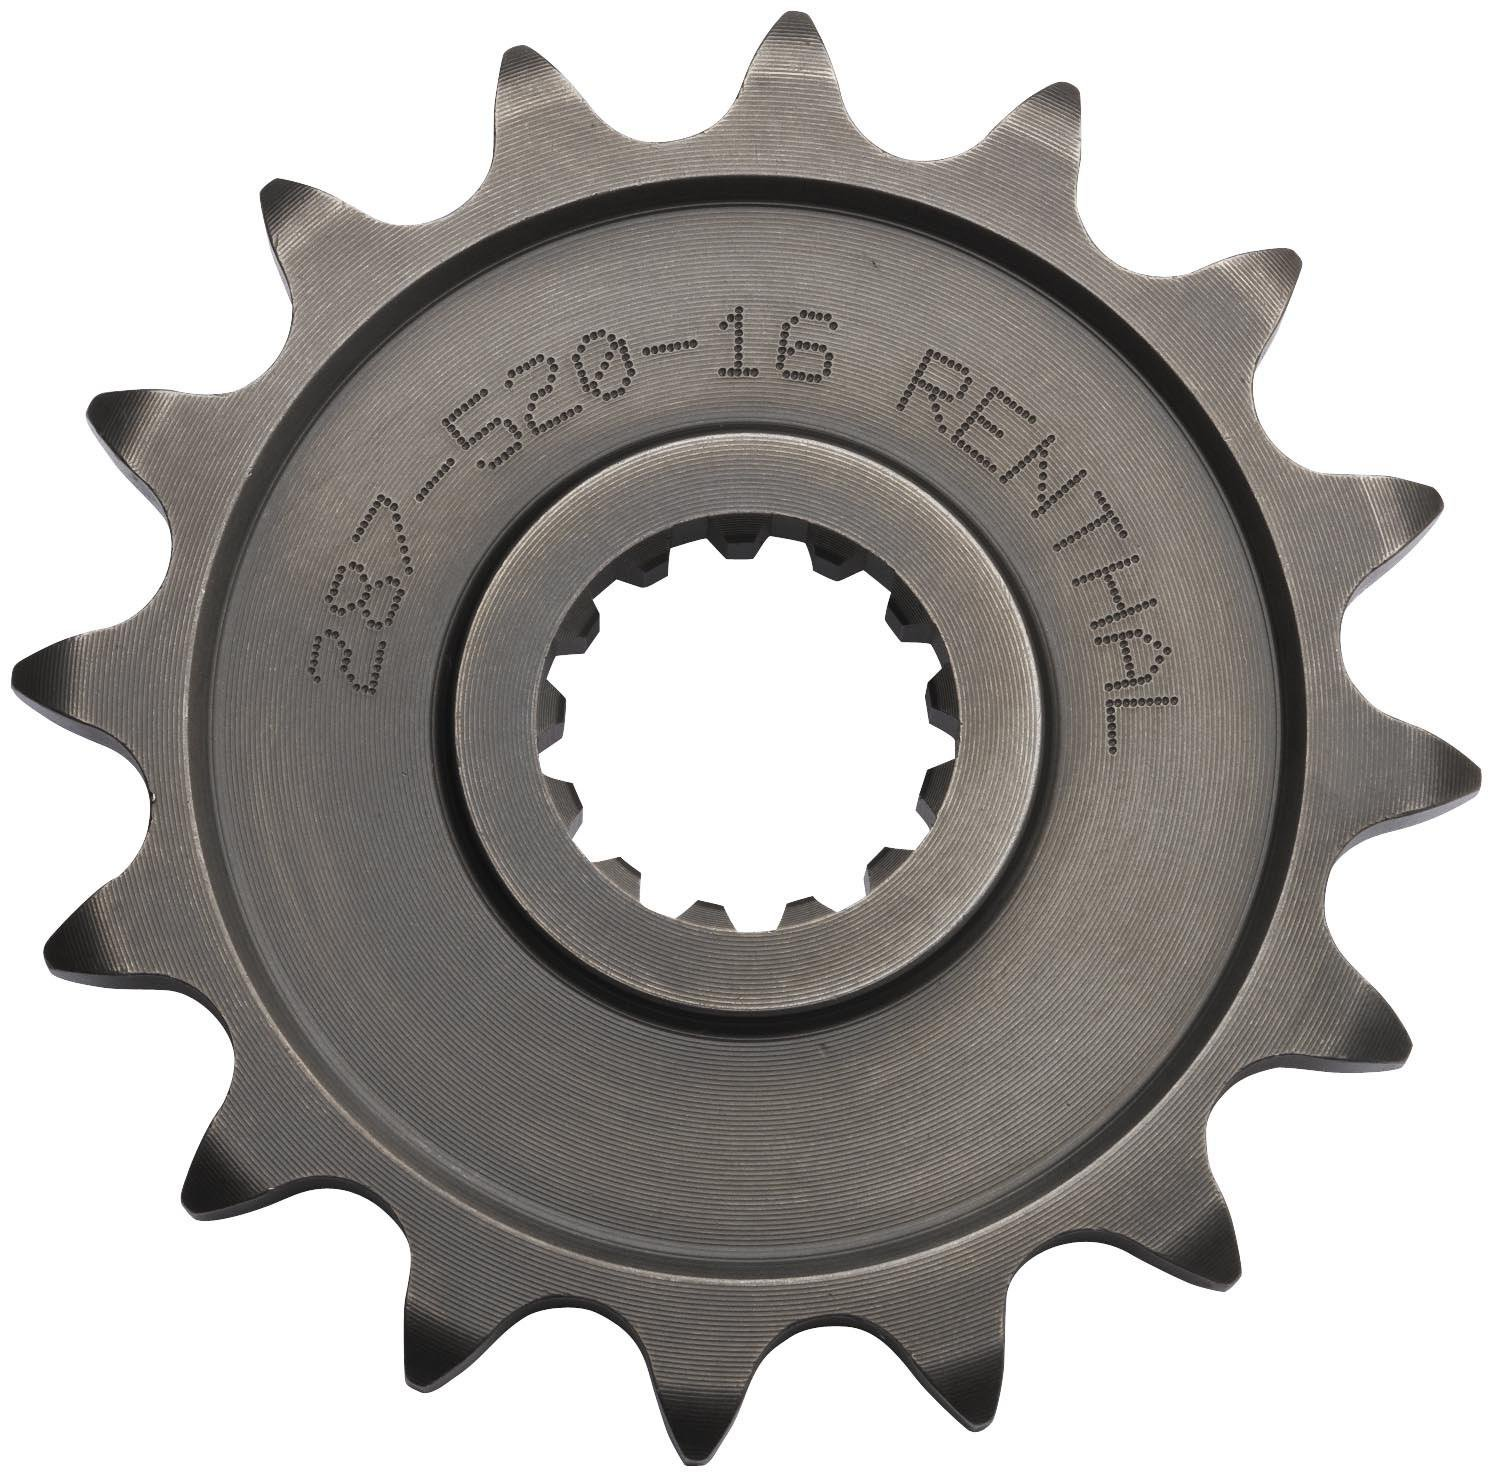 Steel Front Sprocket Renthal 439--520-14GP For Honda CR125R CRF250R CRF250X